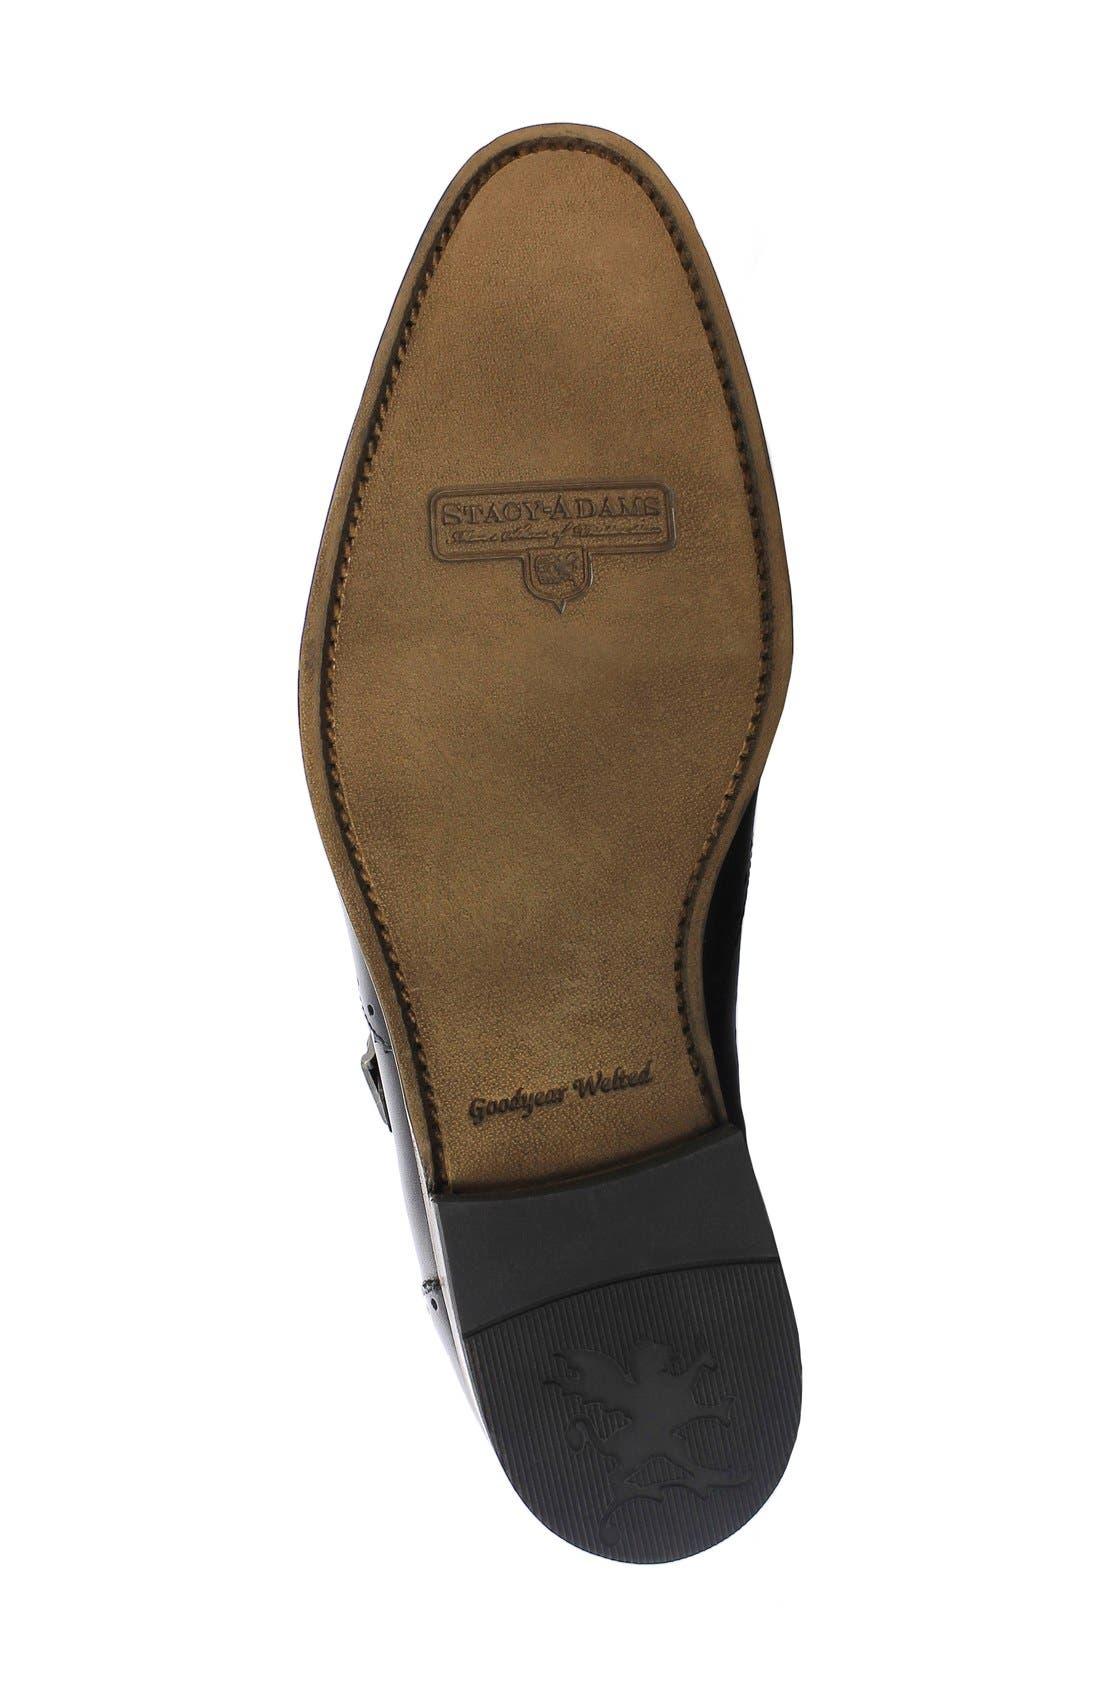 Madison II Monk Strap Shoe,                             Alternate thumbnail 4, color,                             Black